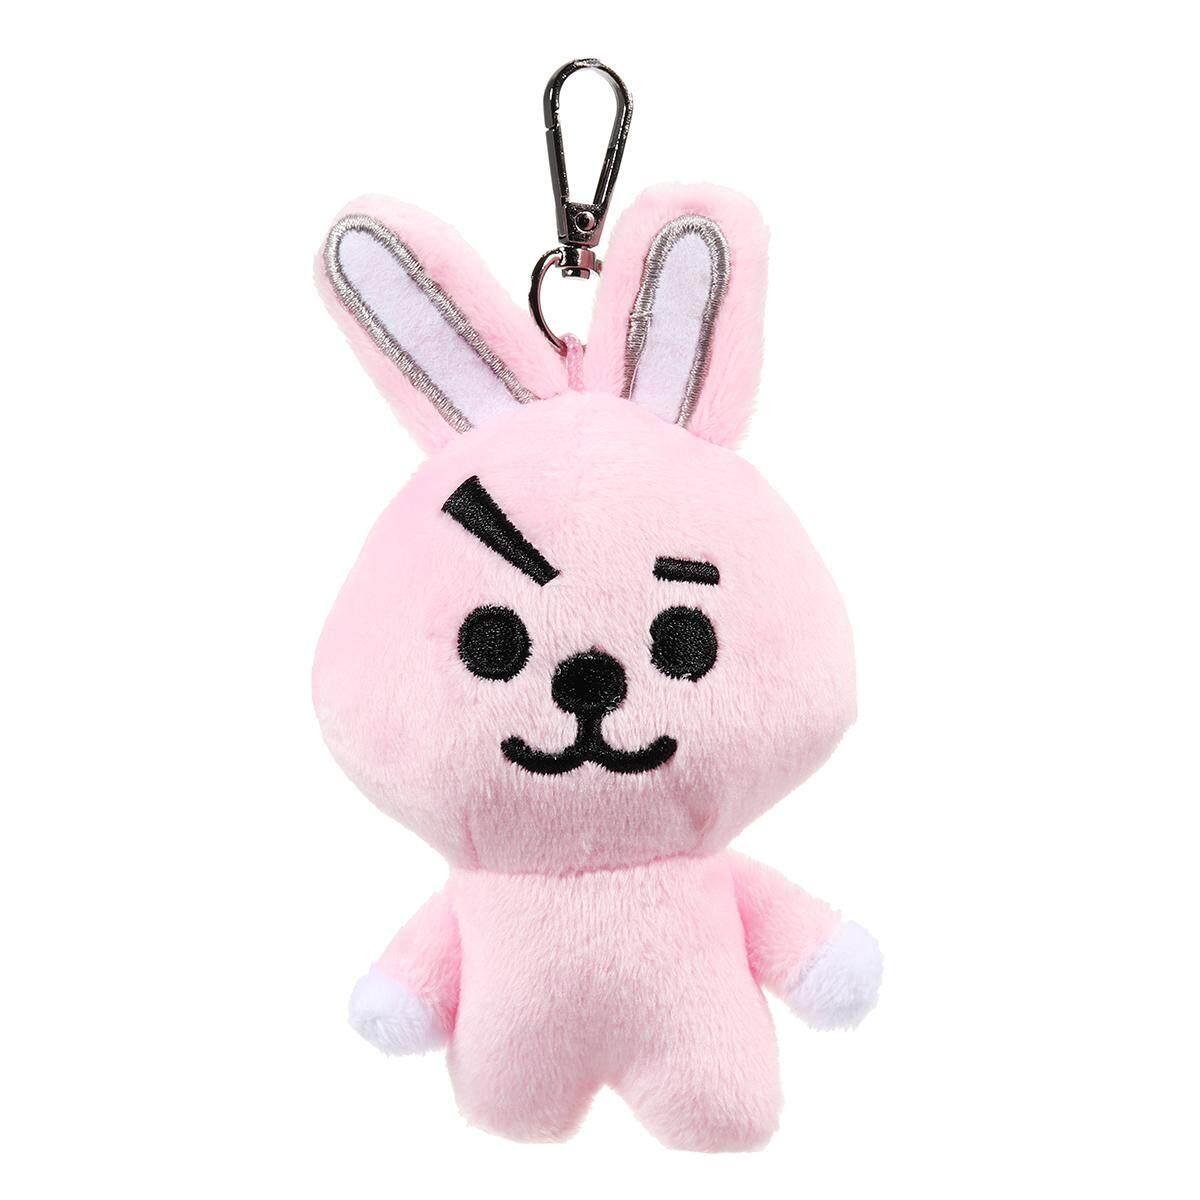 Plush Keychain Key Ring Doll Toy For KPOP BTS BT21 CHIMMY COOKY MANG KOYA SHOOKY - intl